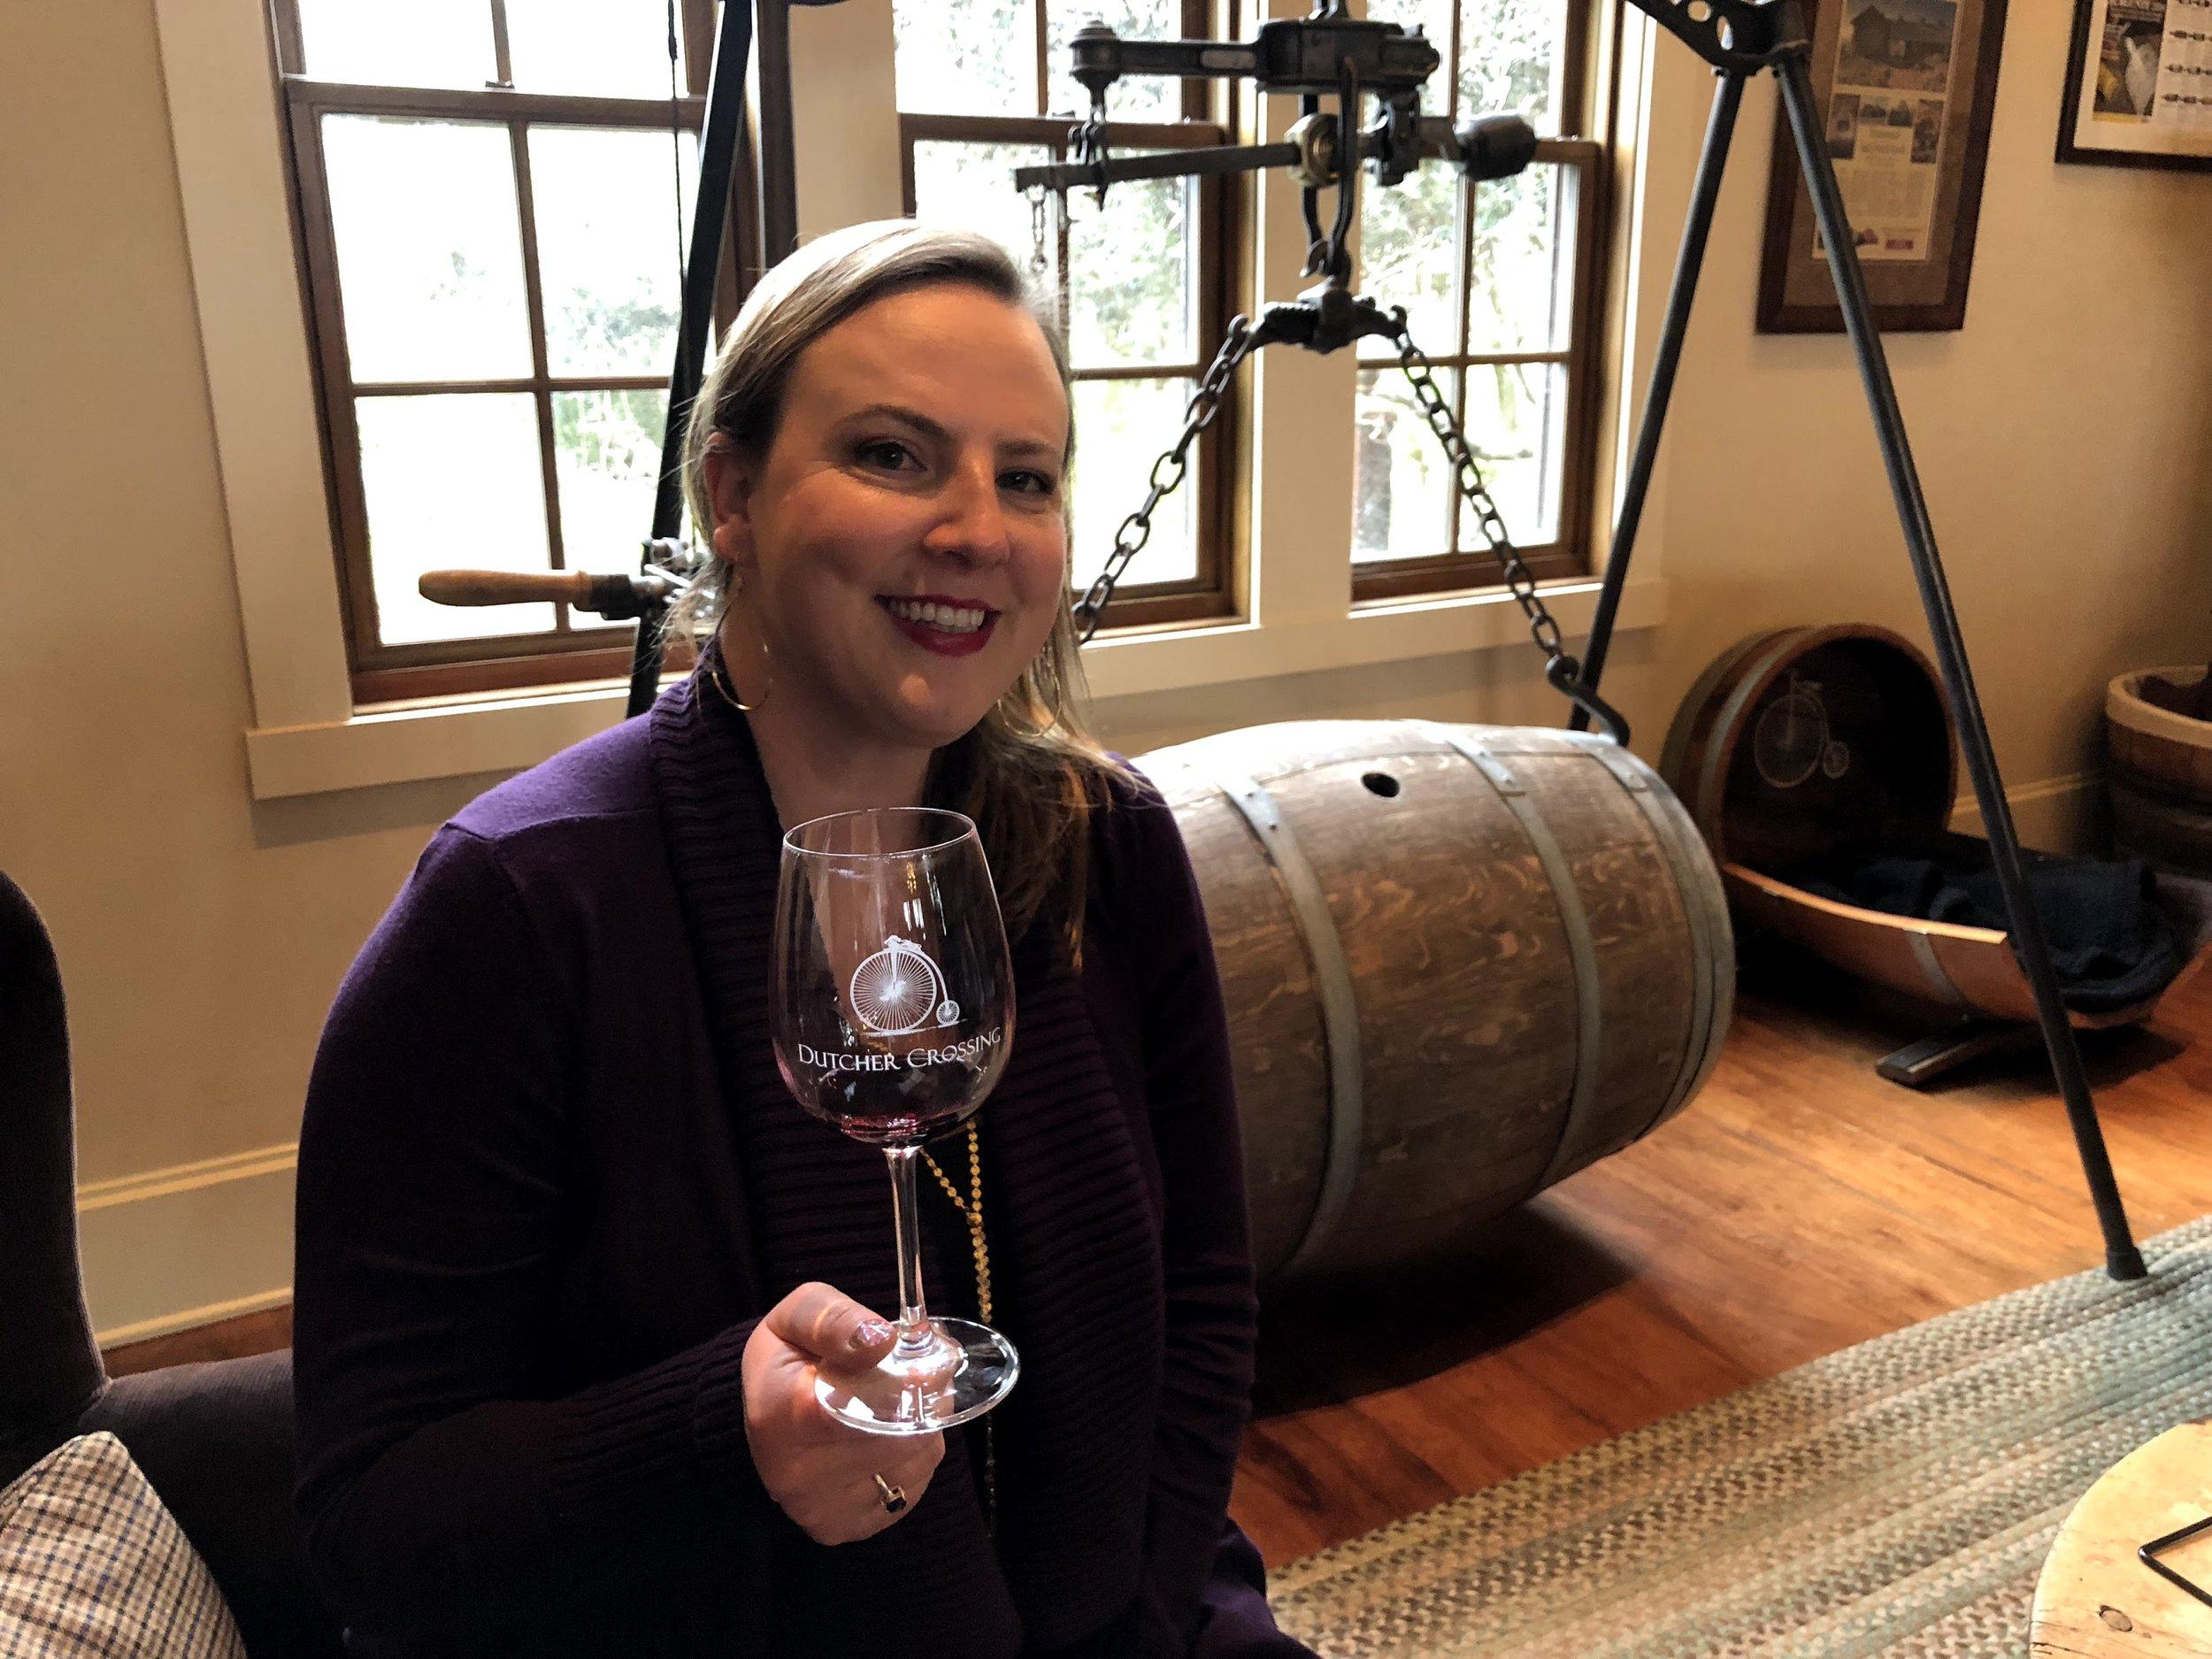 Wine Tasting At Dutcher Crossing